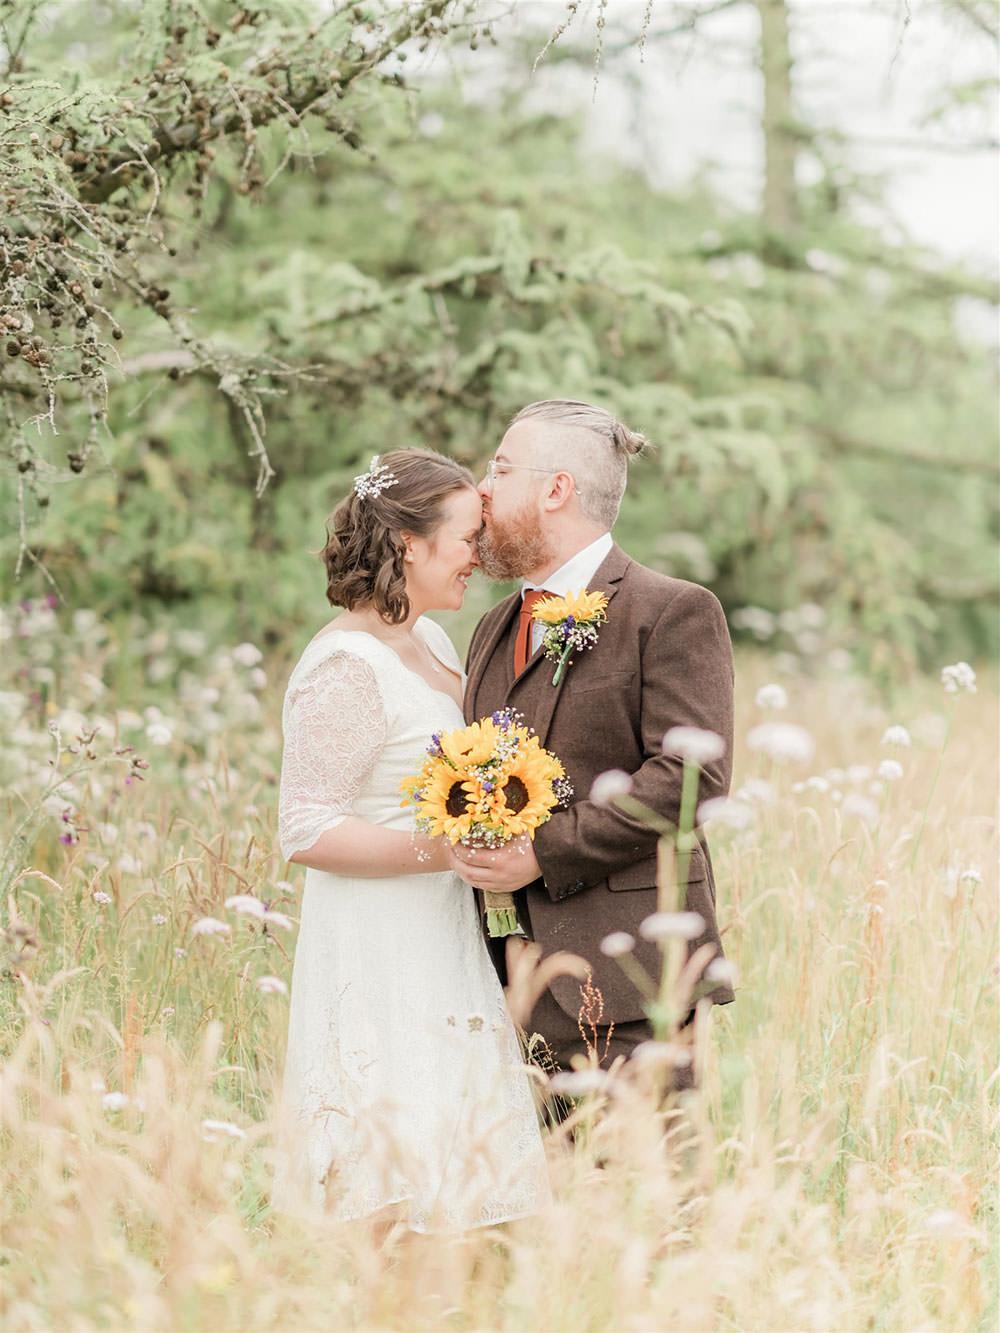 Bride Bridal Long Sleeve Tea Length Dress Lace Slaters Tweed Three Piece Suit Waistcoat Groom Sunflower Bouquet Surprise Wedding Carn Patrick Photography